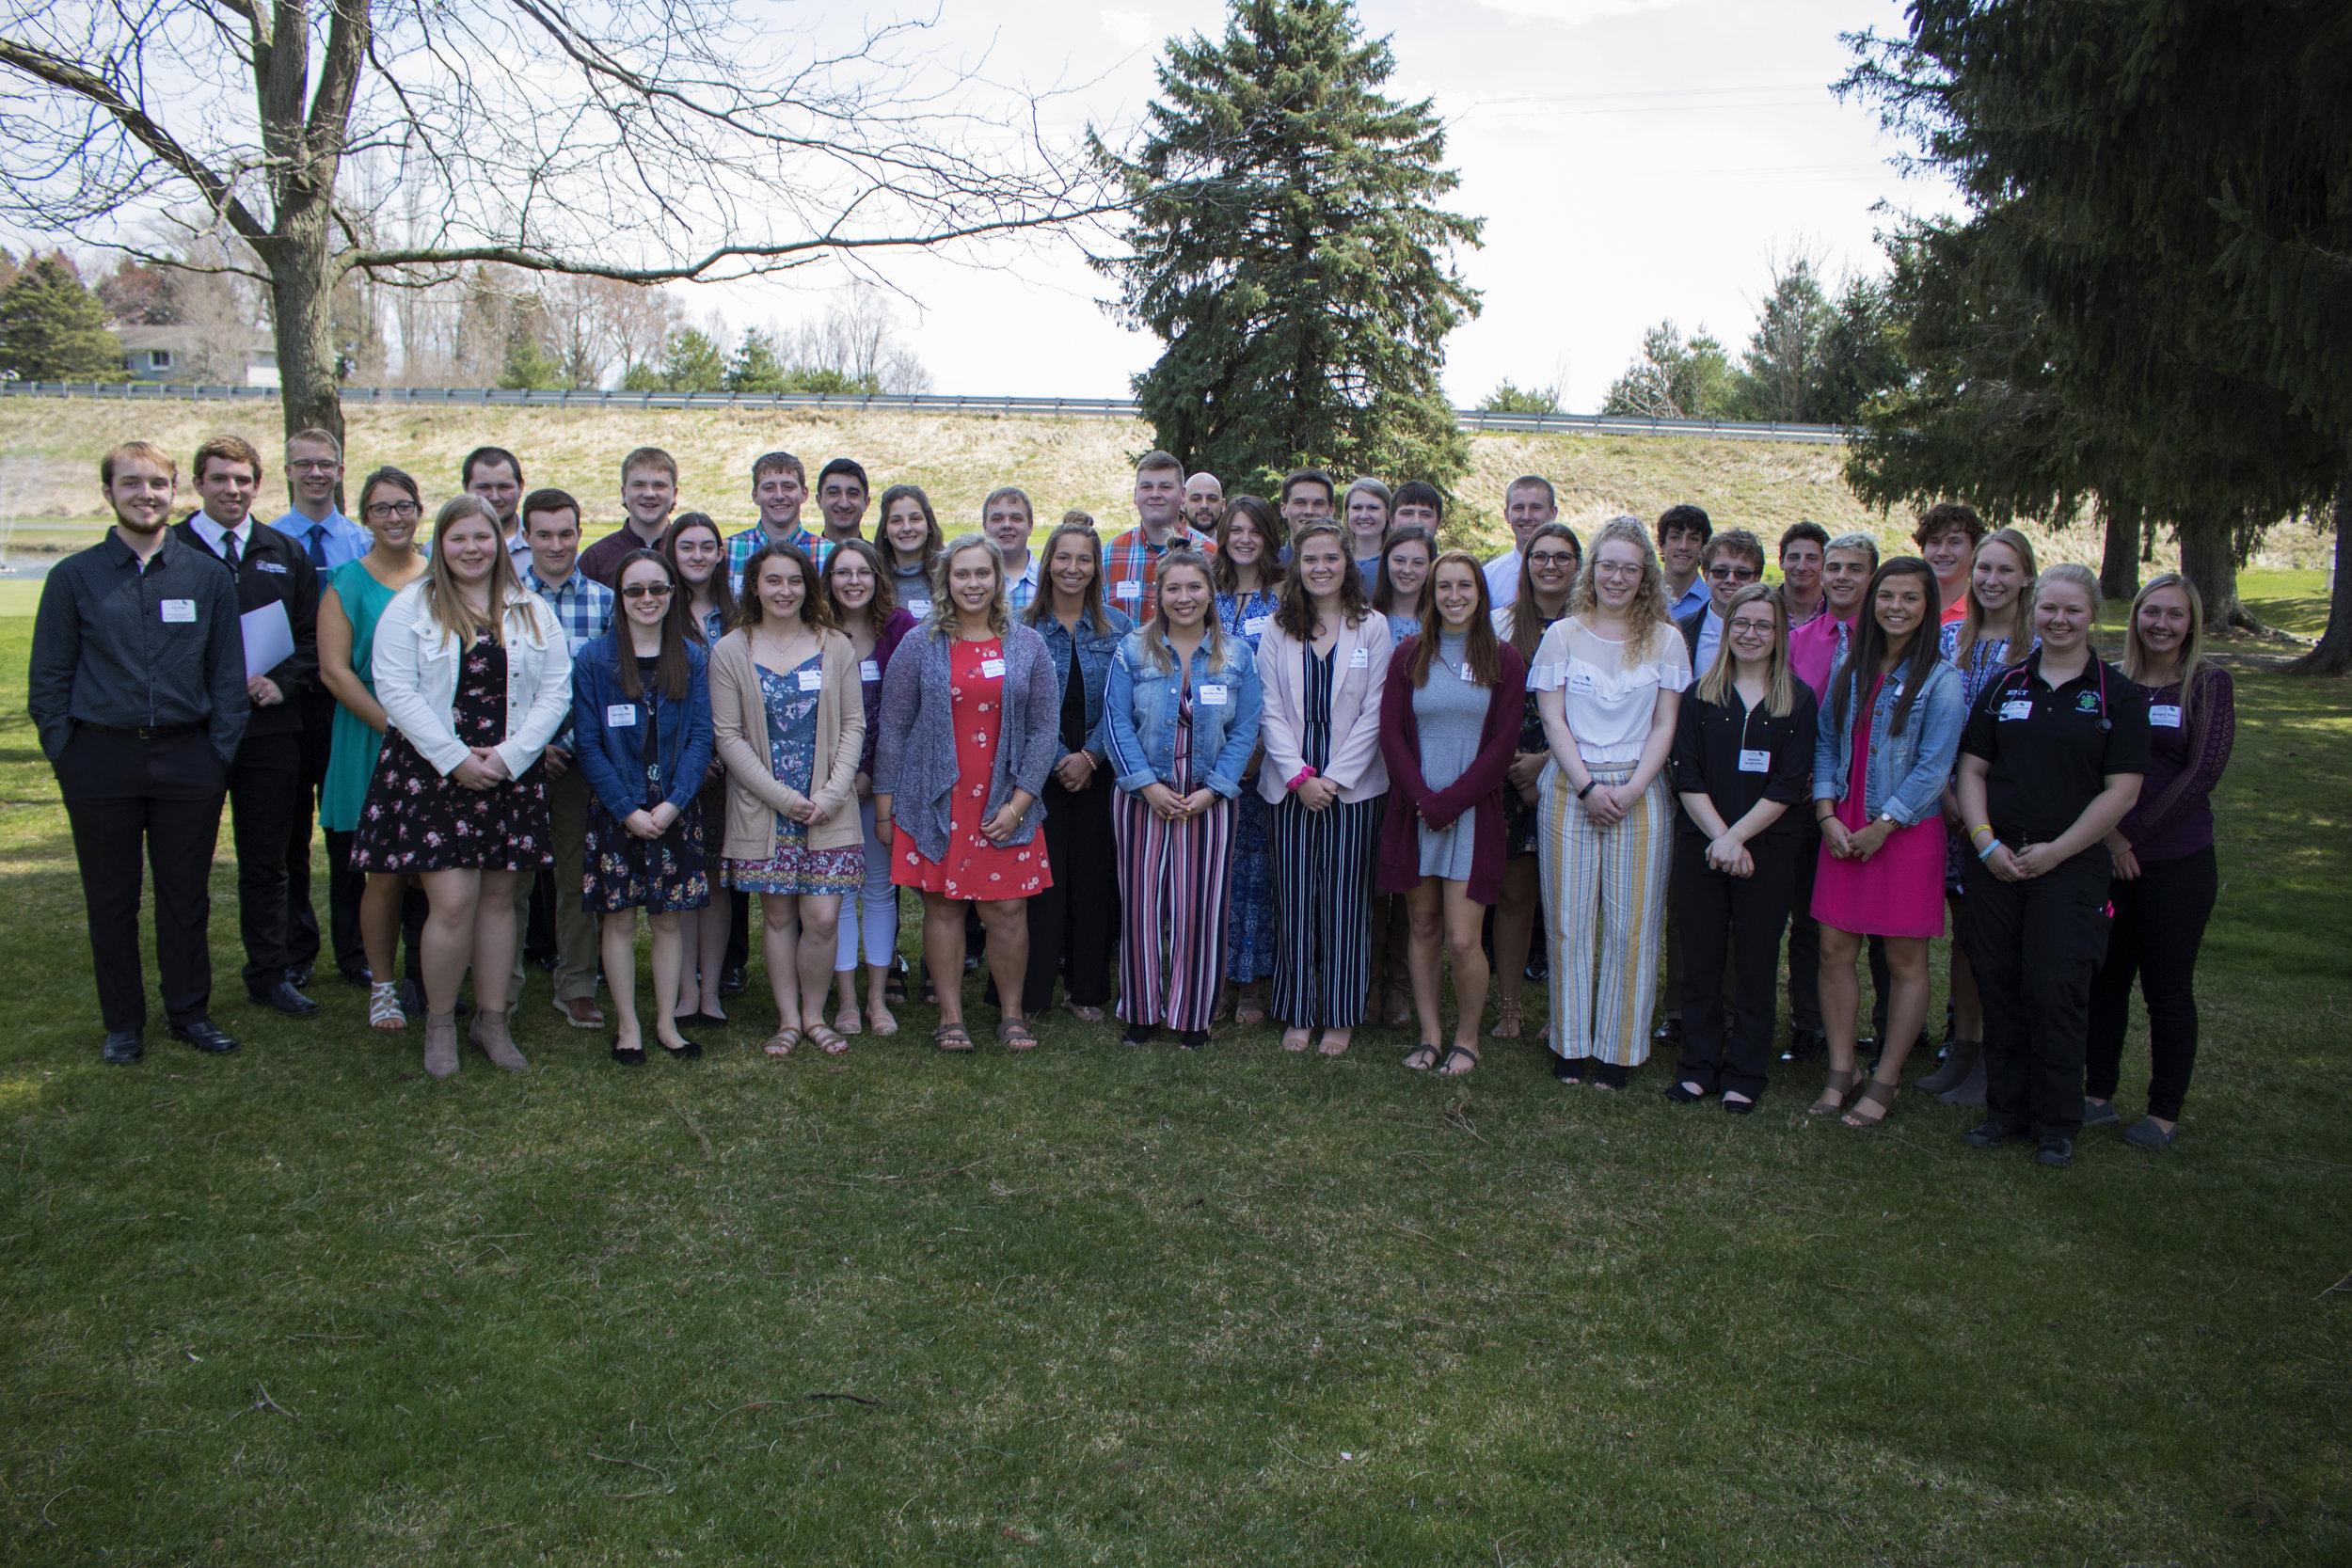 The 2019 HCCF Scholarship Recipients